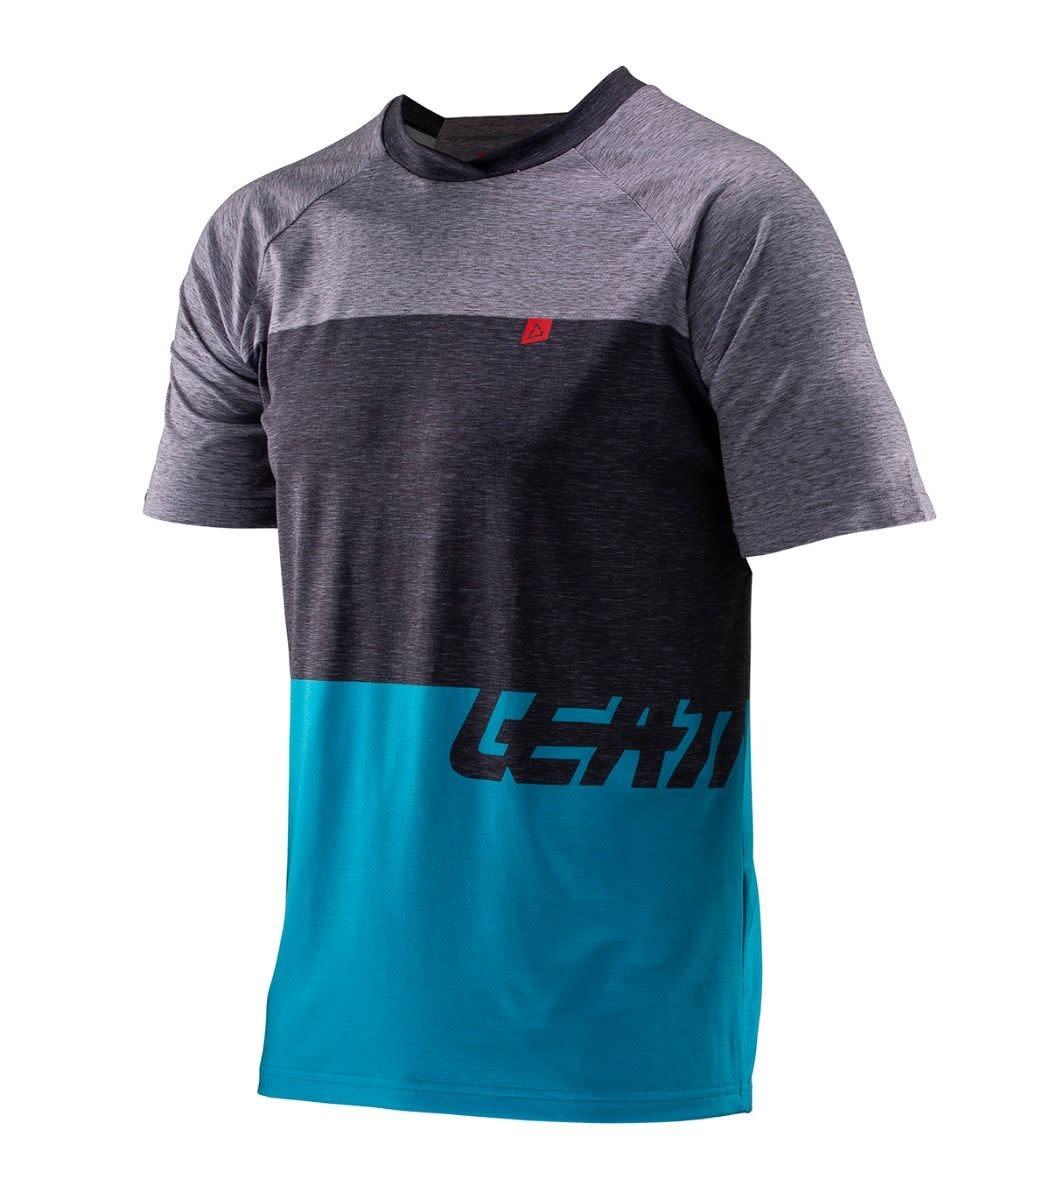 Leatt Leatt Jersey DBX 2.0 #L Blue